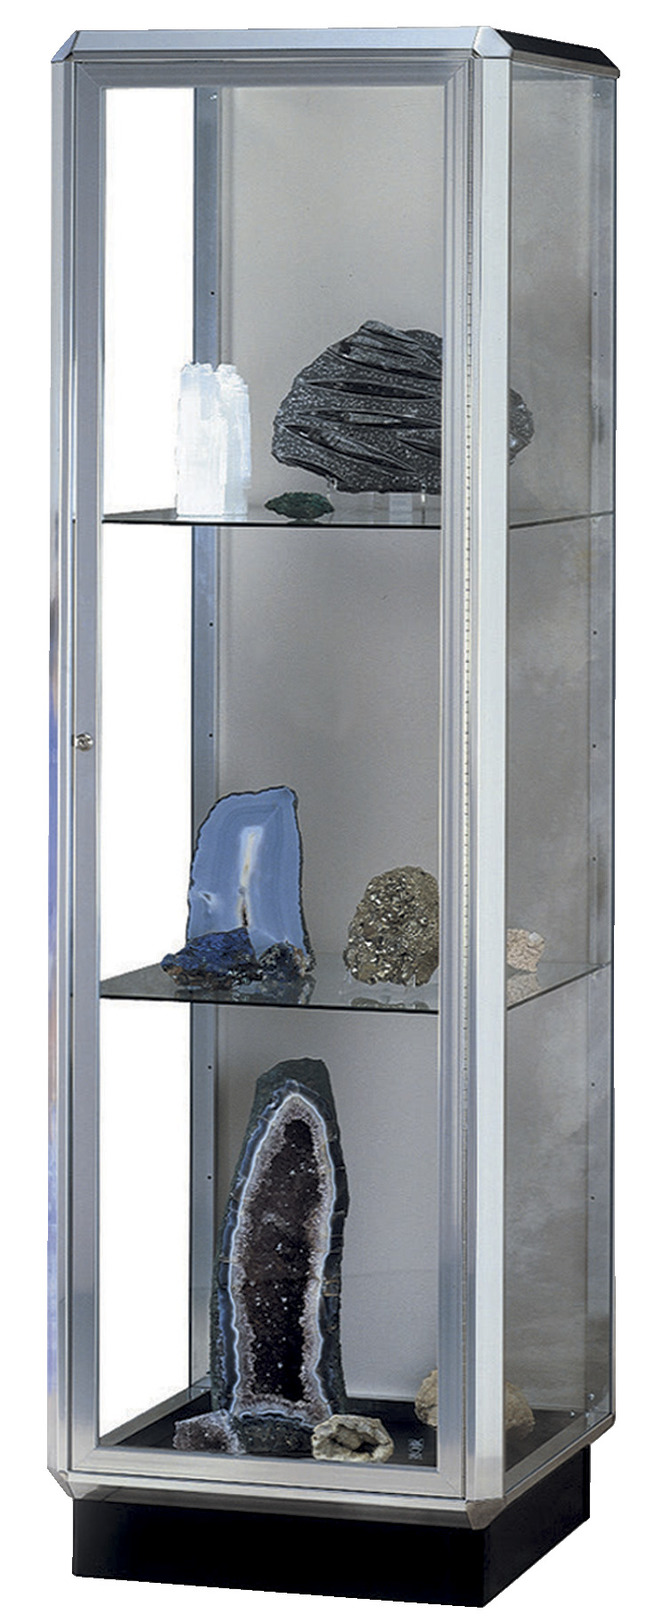 Trophy Cases, Display Cases Supplies, Item Number 673020